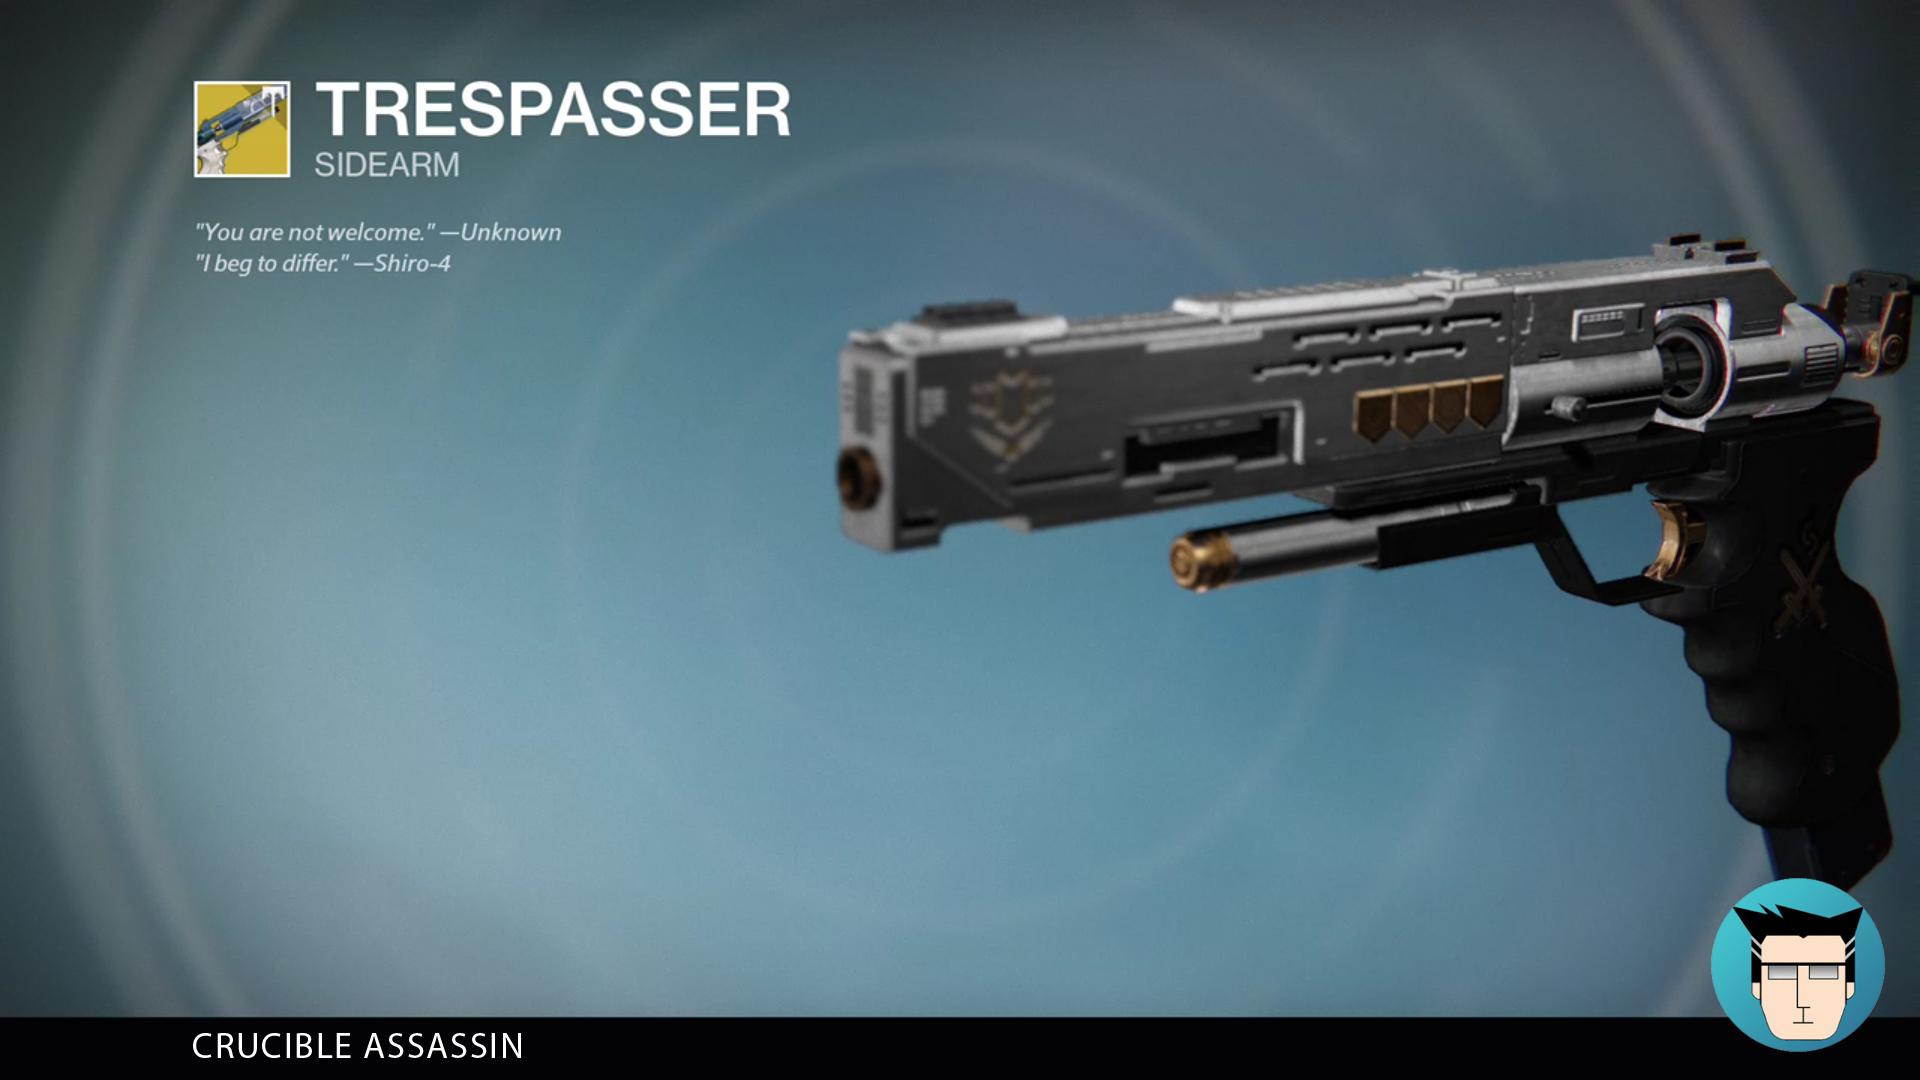 TRESPASSER | CRUCIBLE ASSASSIN